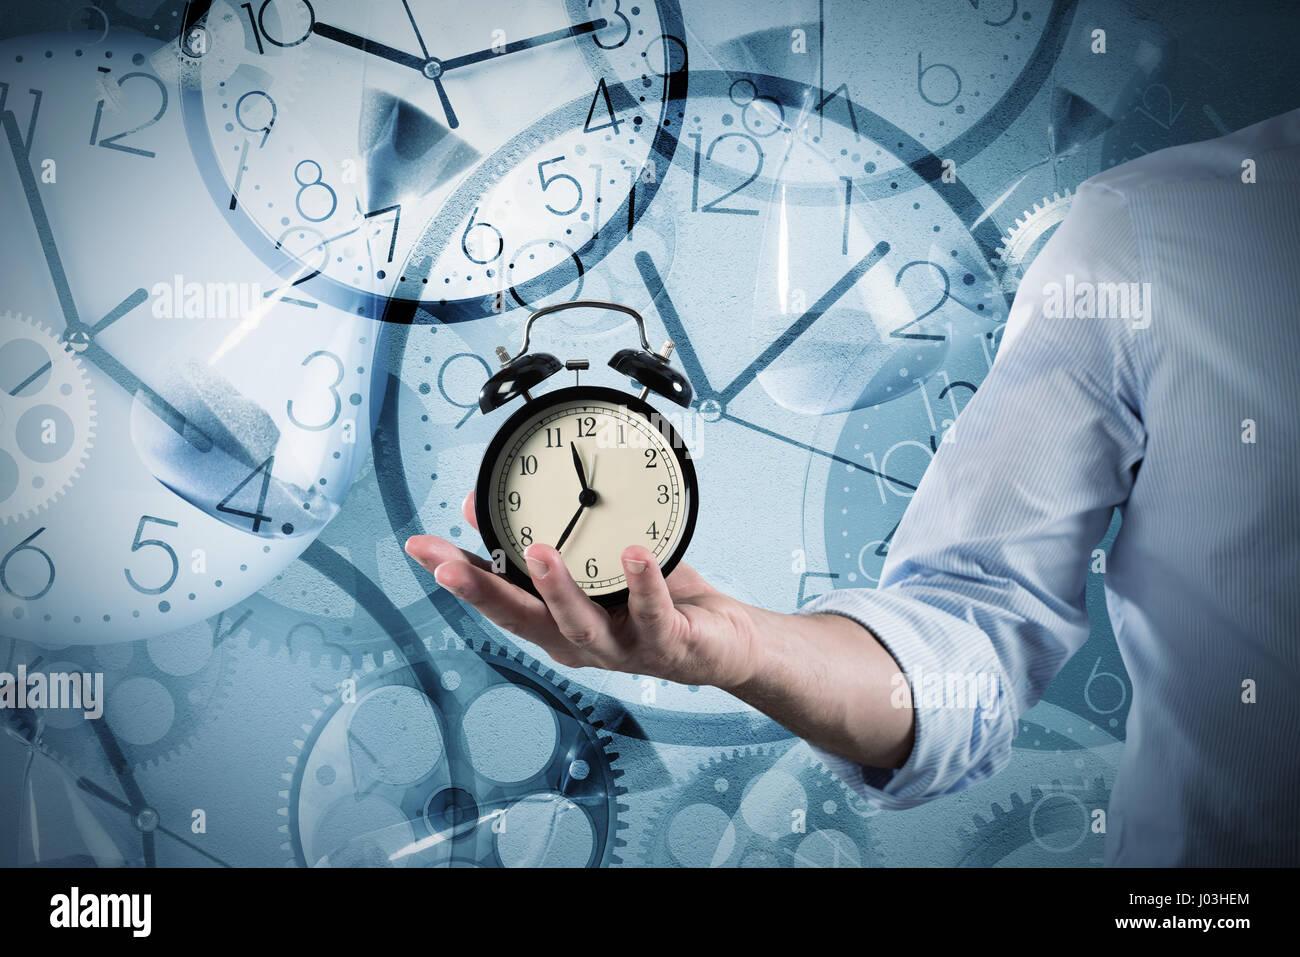 Alarm clock - Stock Image